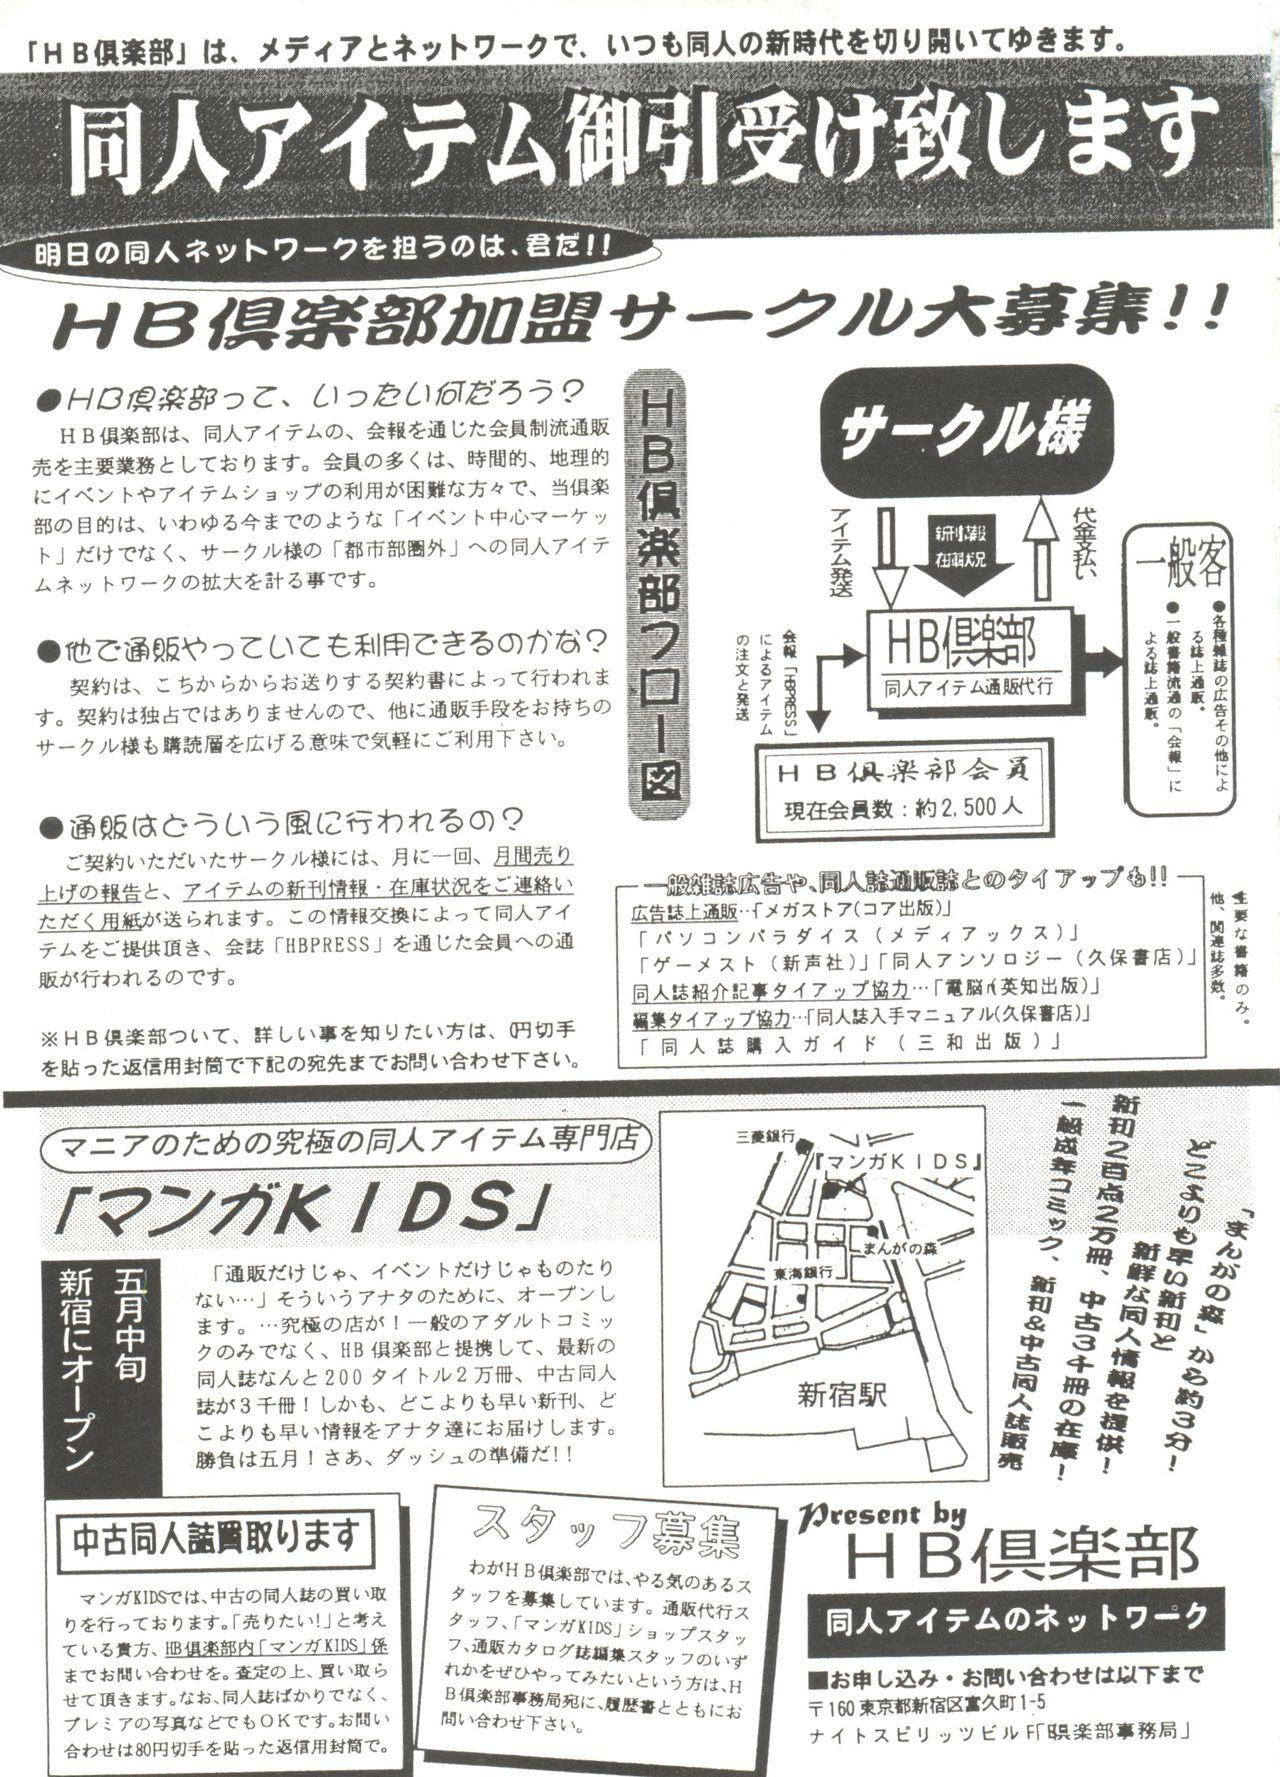 Bishoujo Doujin Peach Club - Pretty Gal's Fanzine Peach Club 9 142